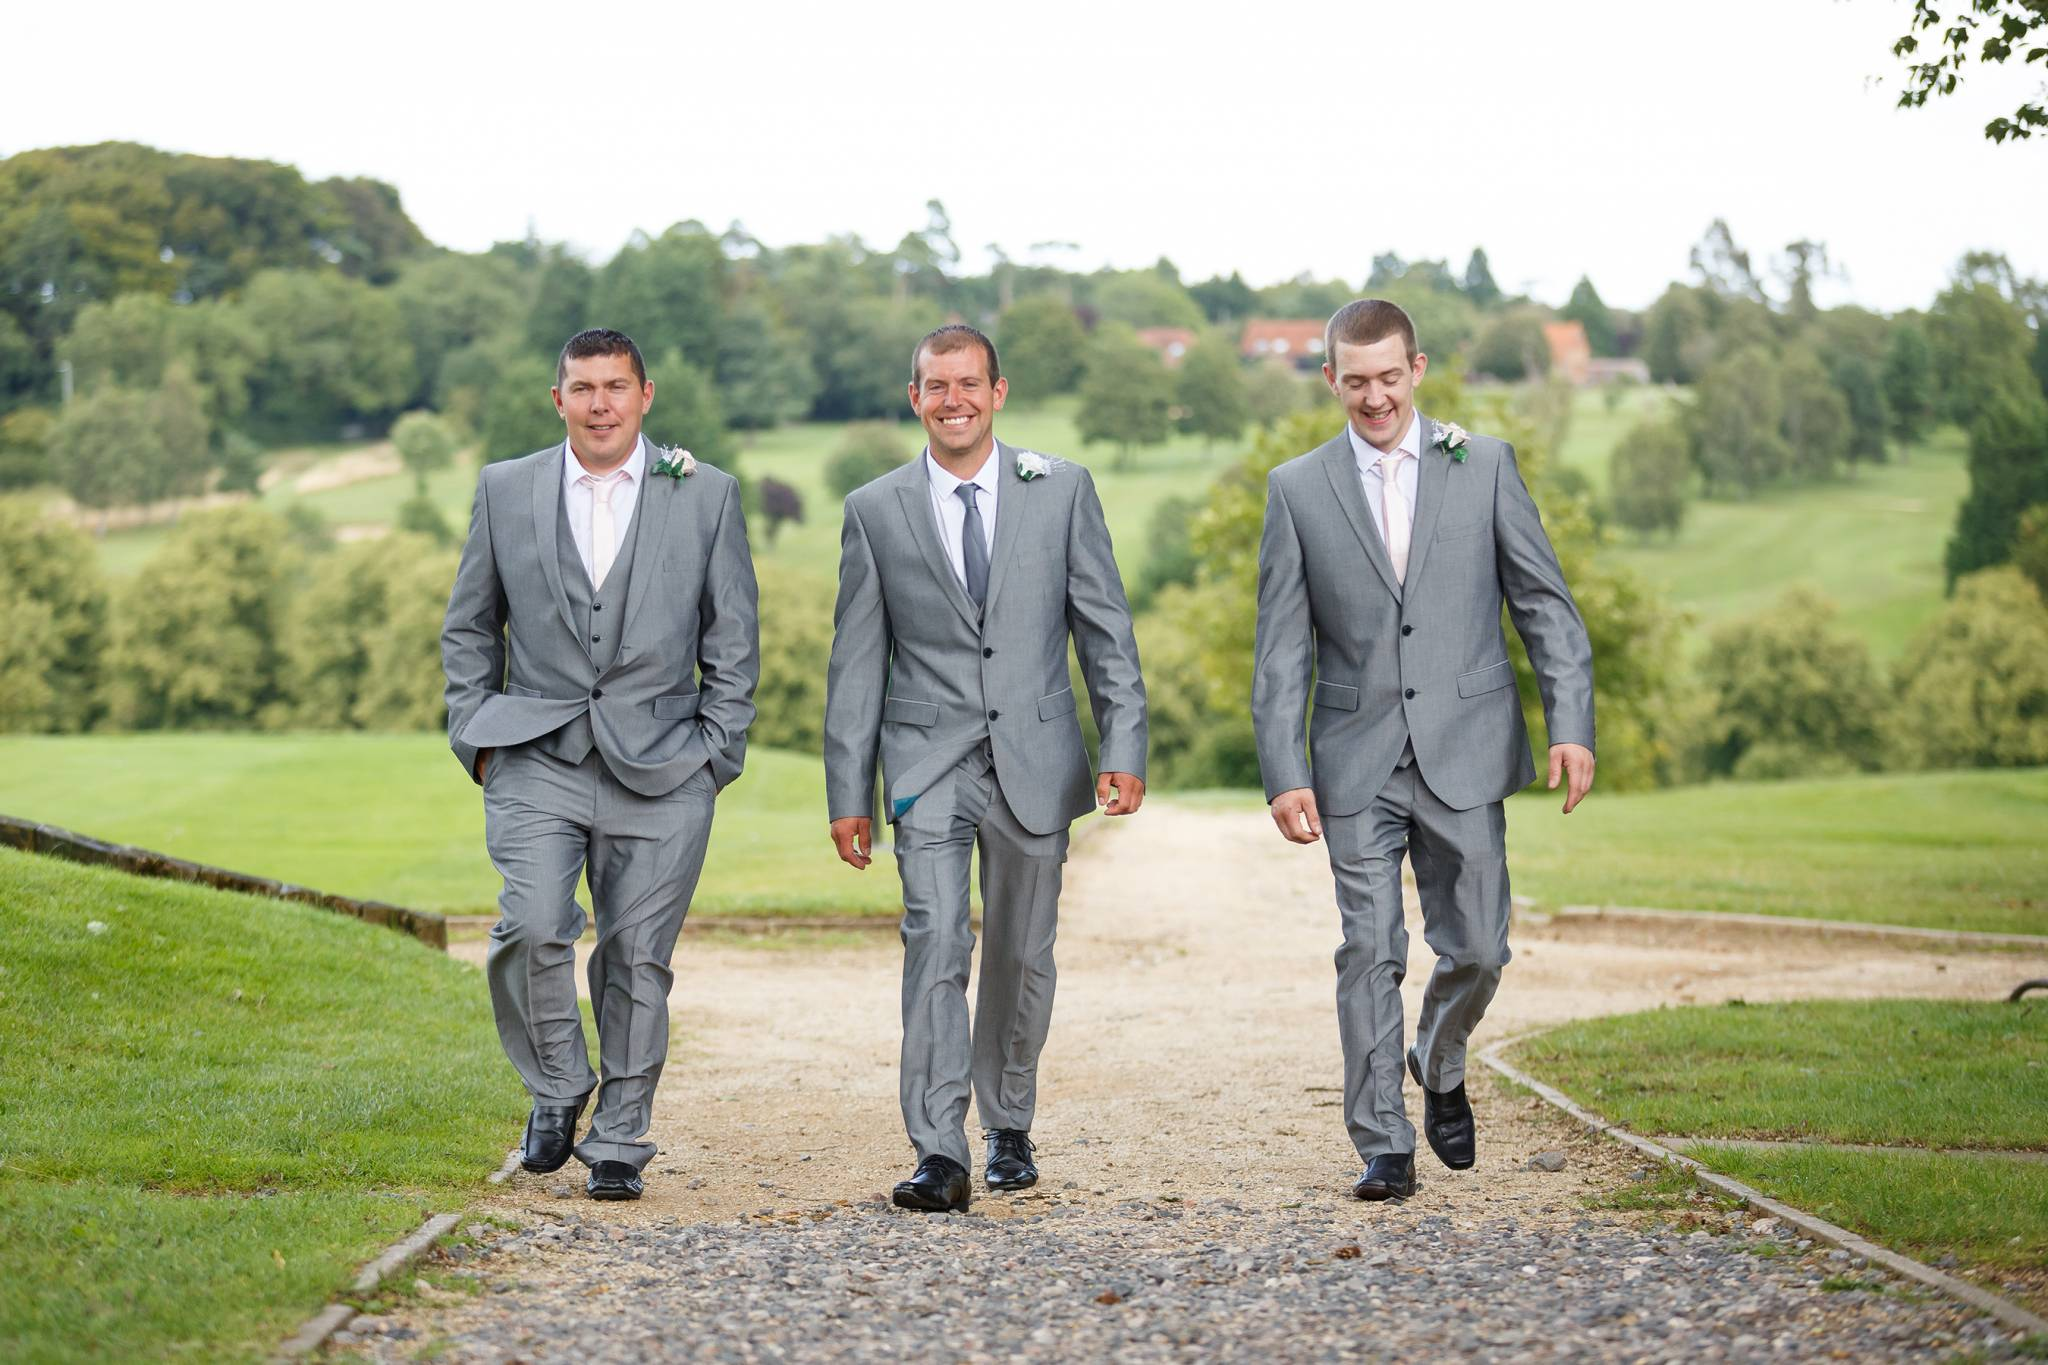 wedding photographer, wedding photographer, Hazelmere Golf Club, high wycombe, buckinghamshire, bucks